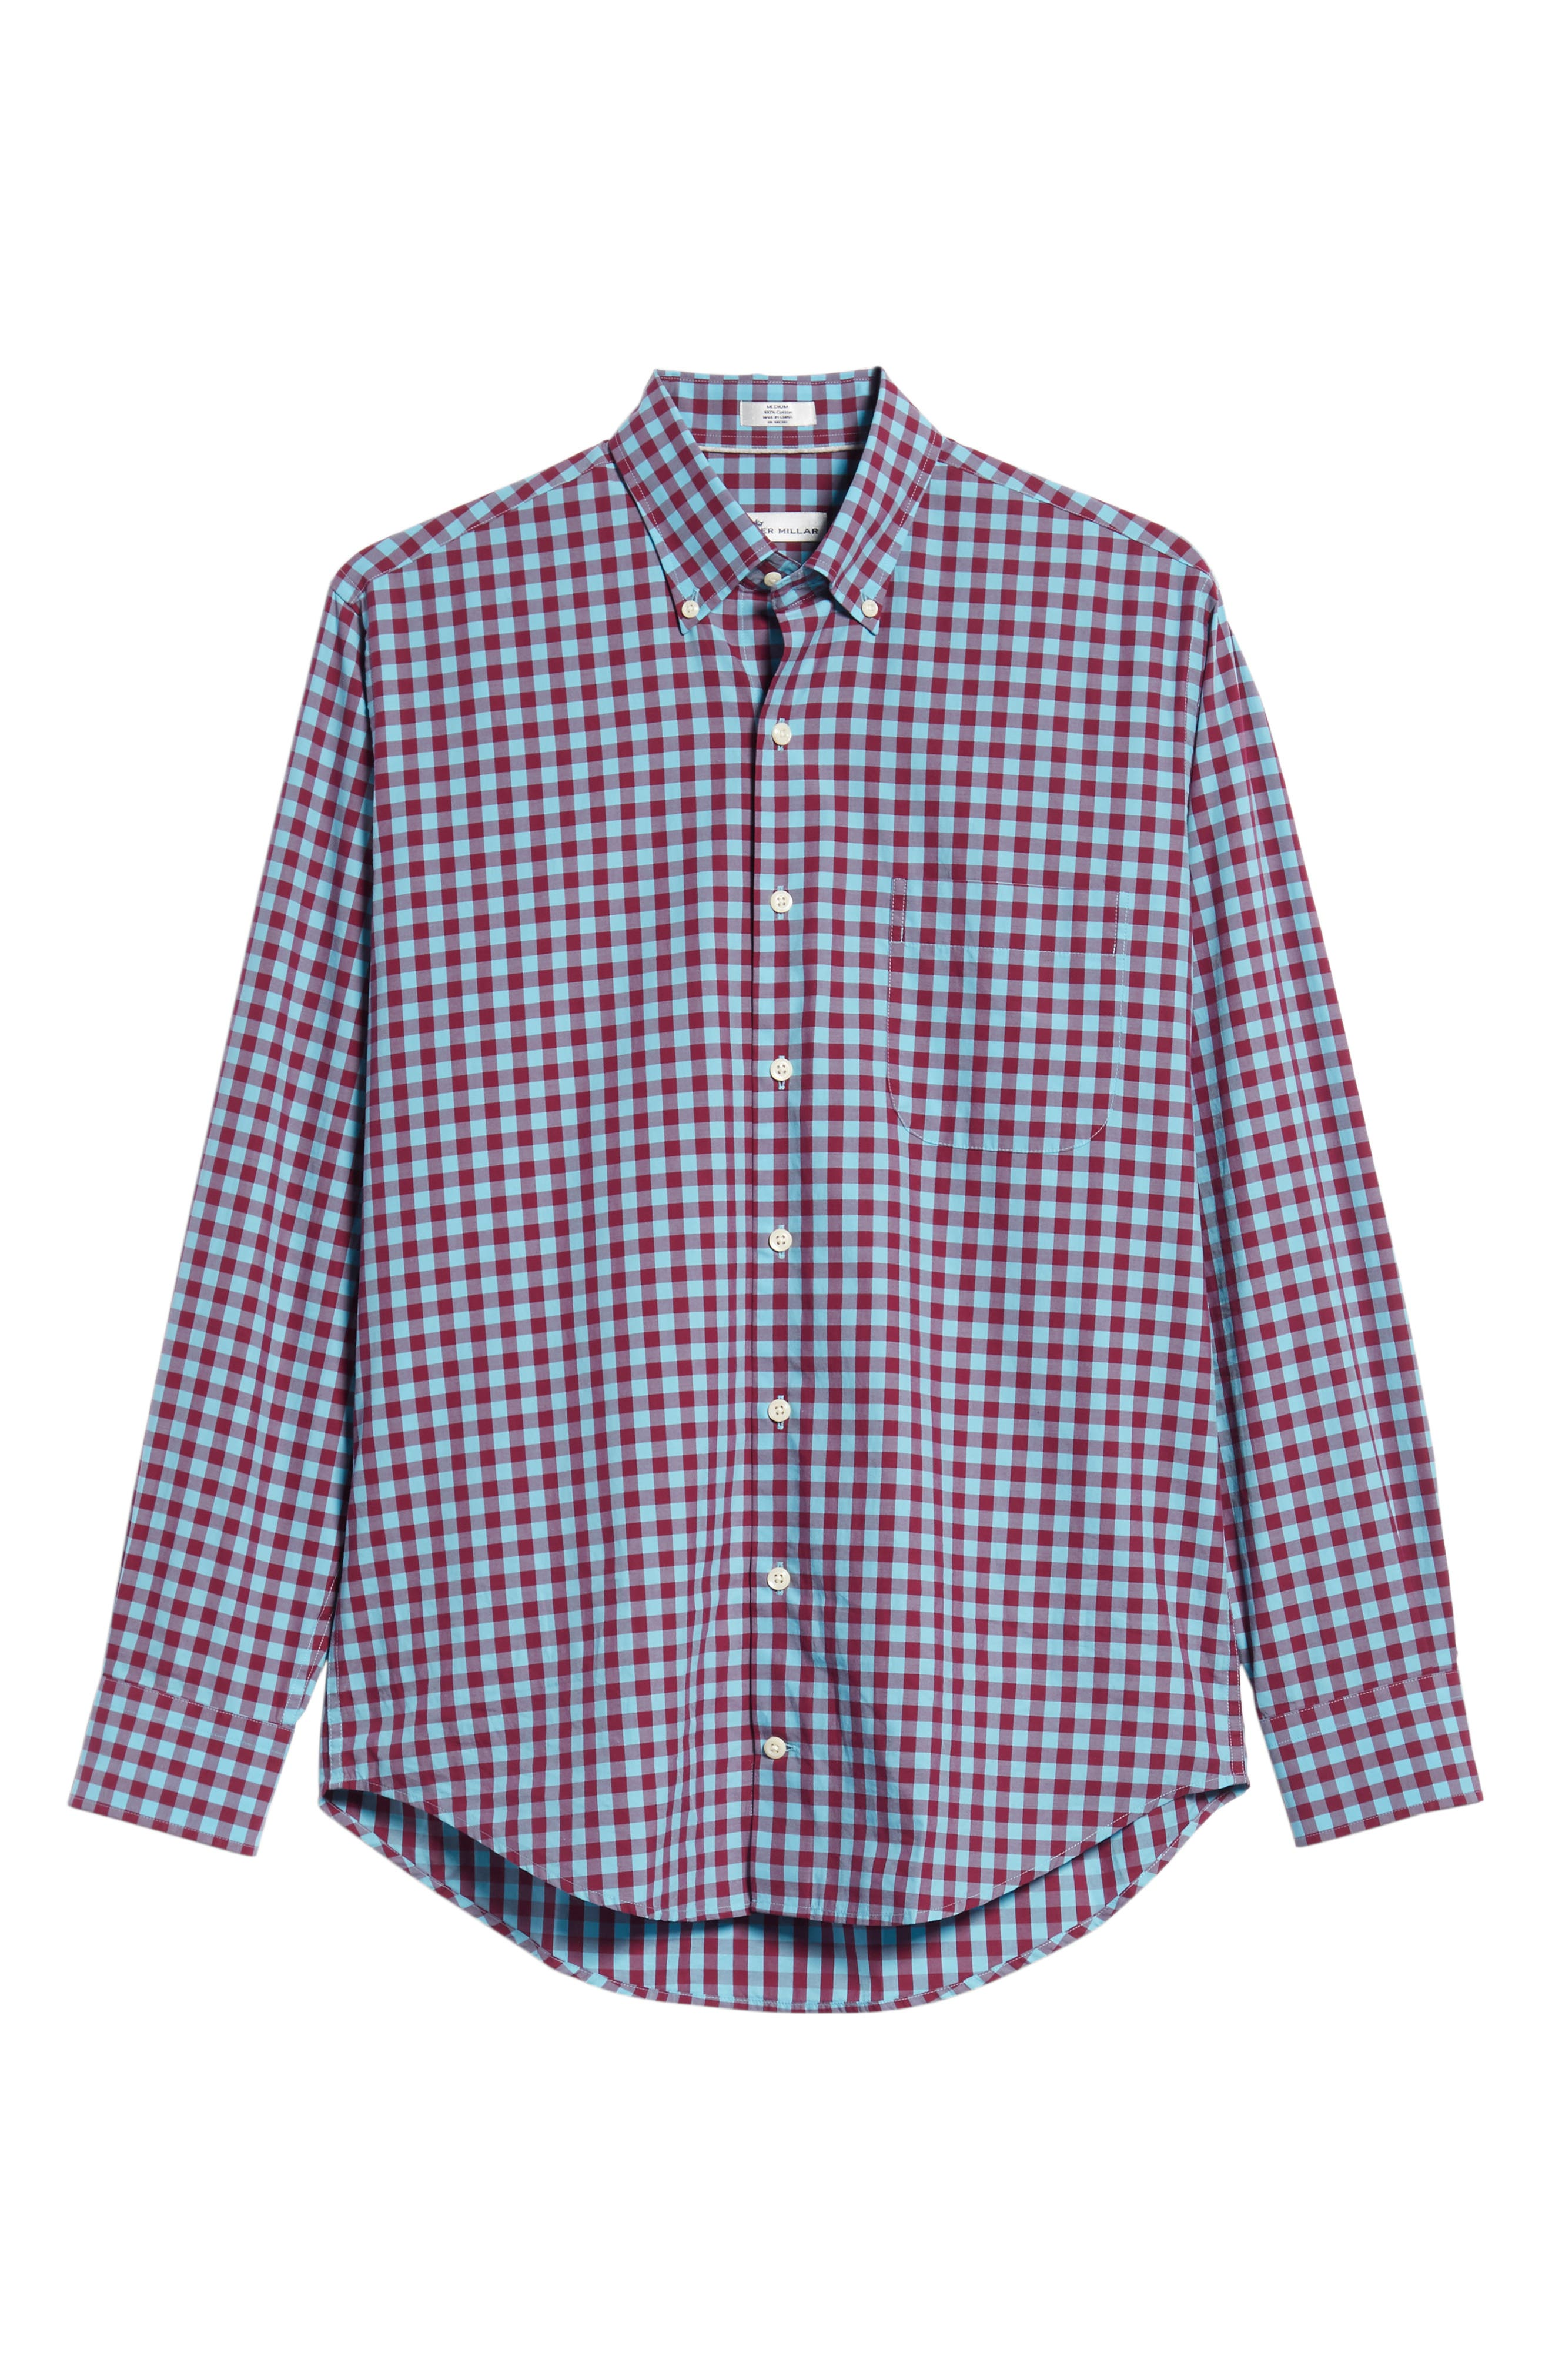 Mont Blanc Gingham Check Sport Shirt,                             Alternate thumbnail 5, color,                             GROTTO BLUE